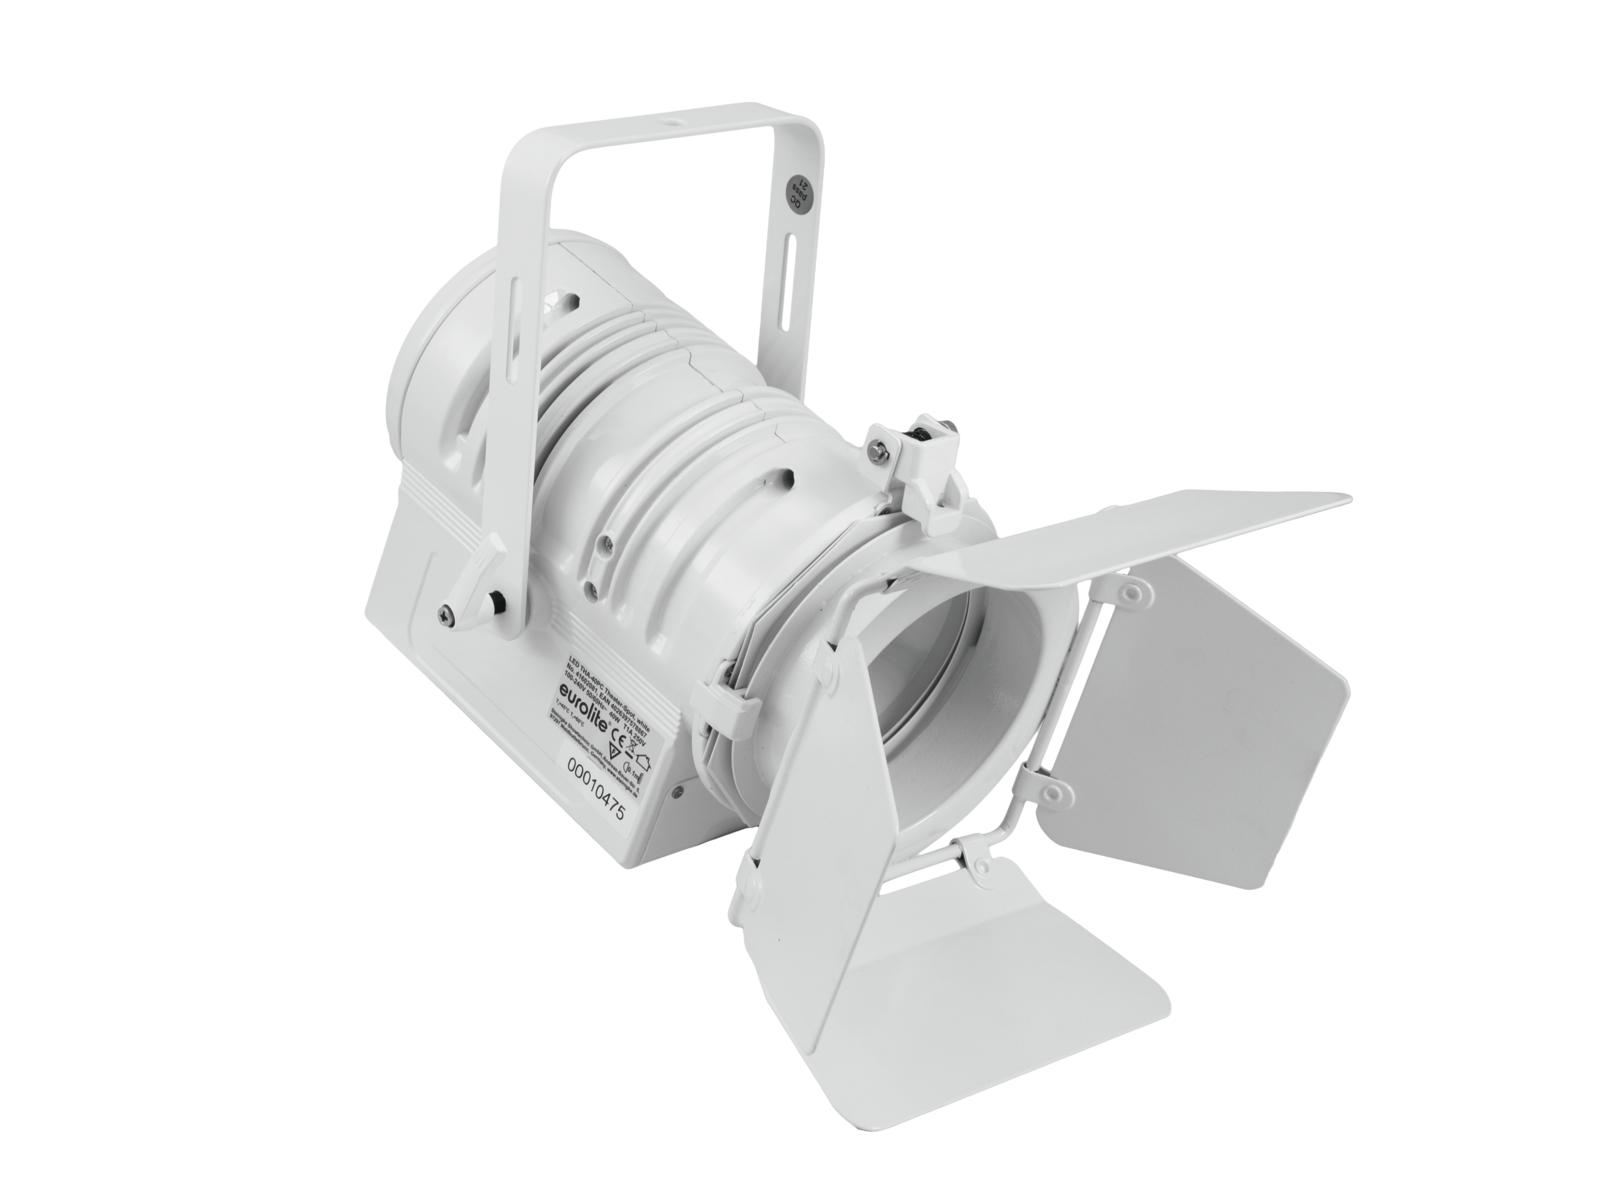 Eurolite LED THA-40PC DL divadelní reflektor, bílý